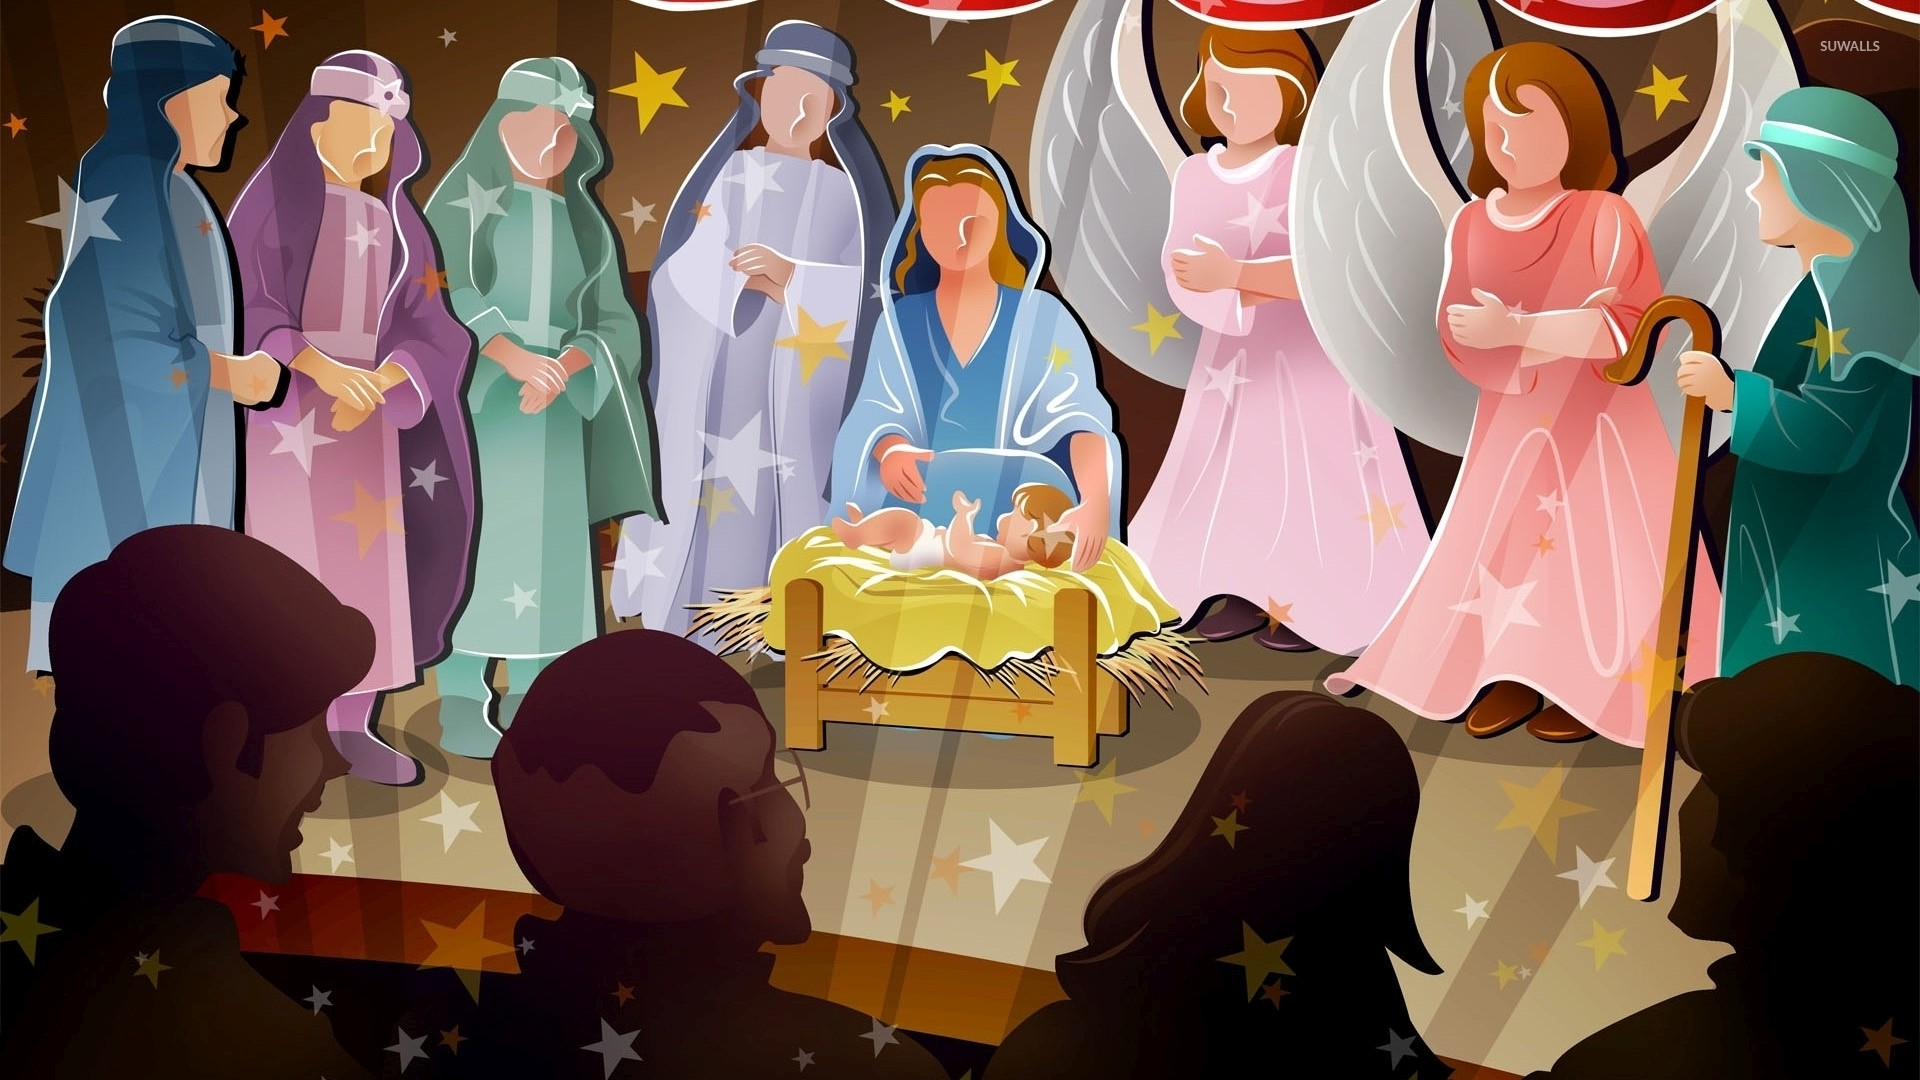 Nativity scene [2] wallpaper jpg